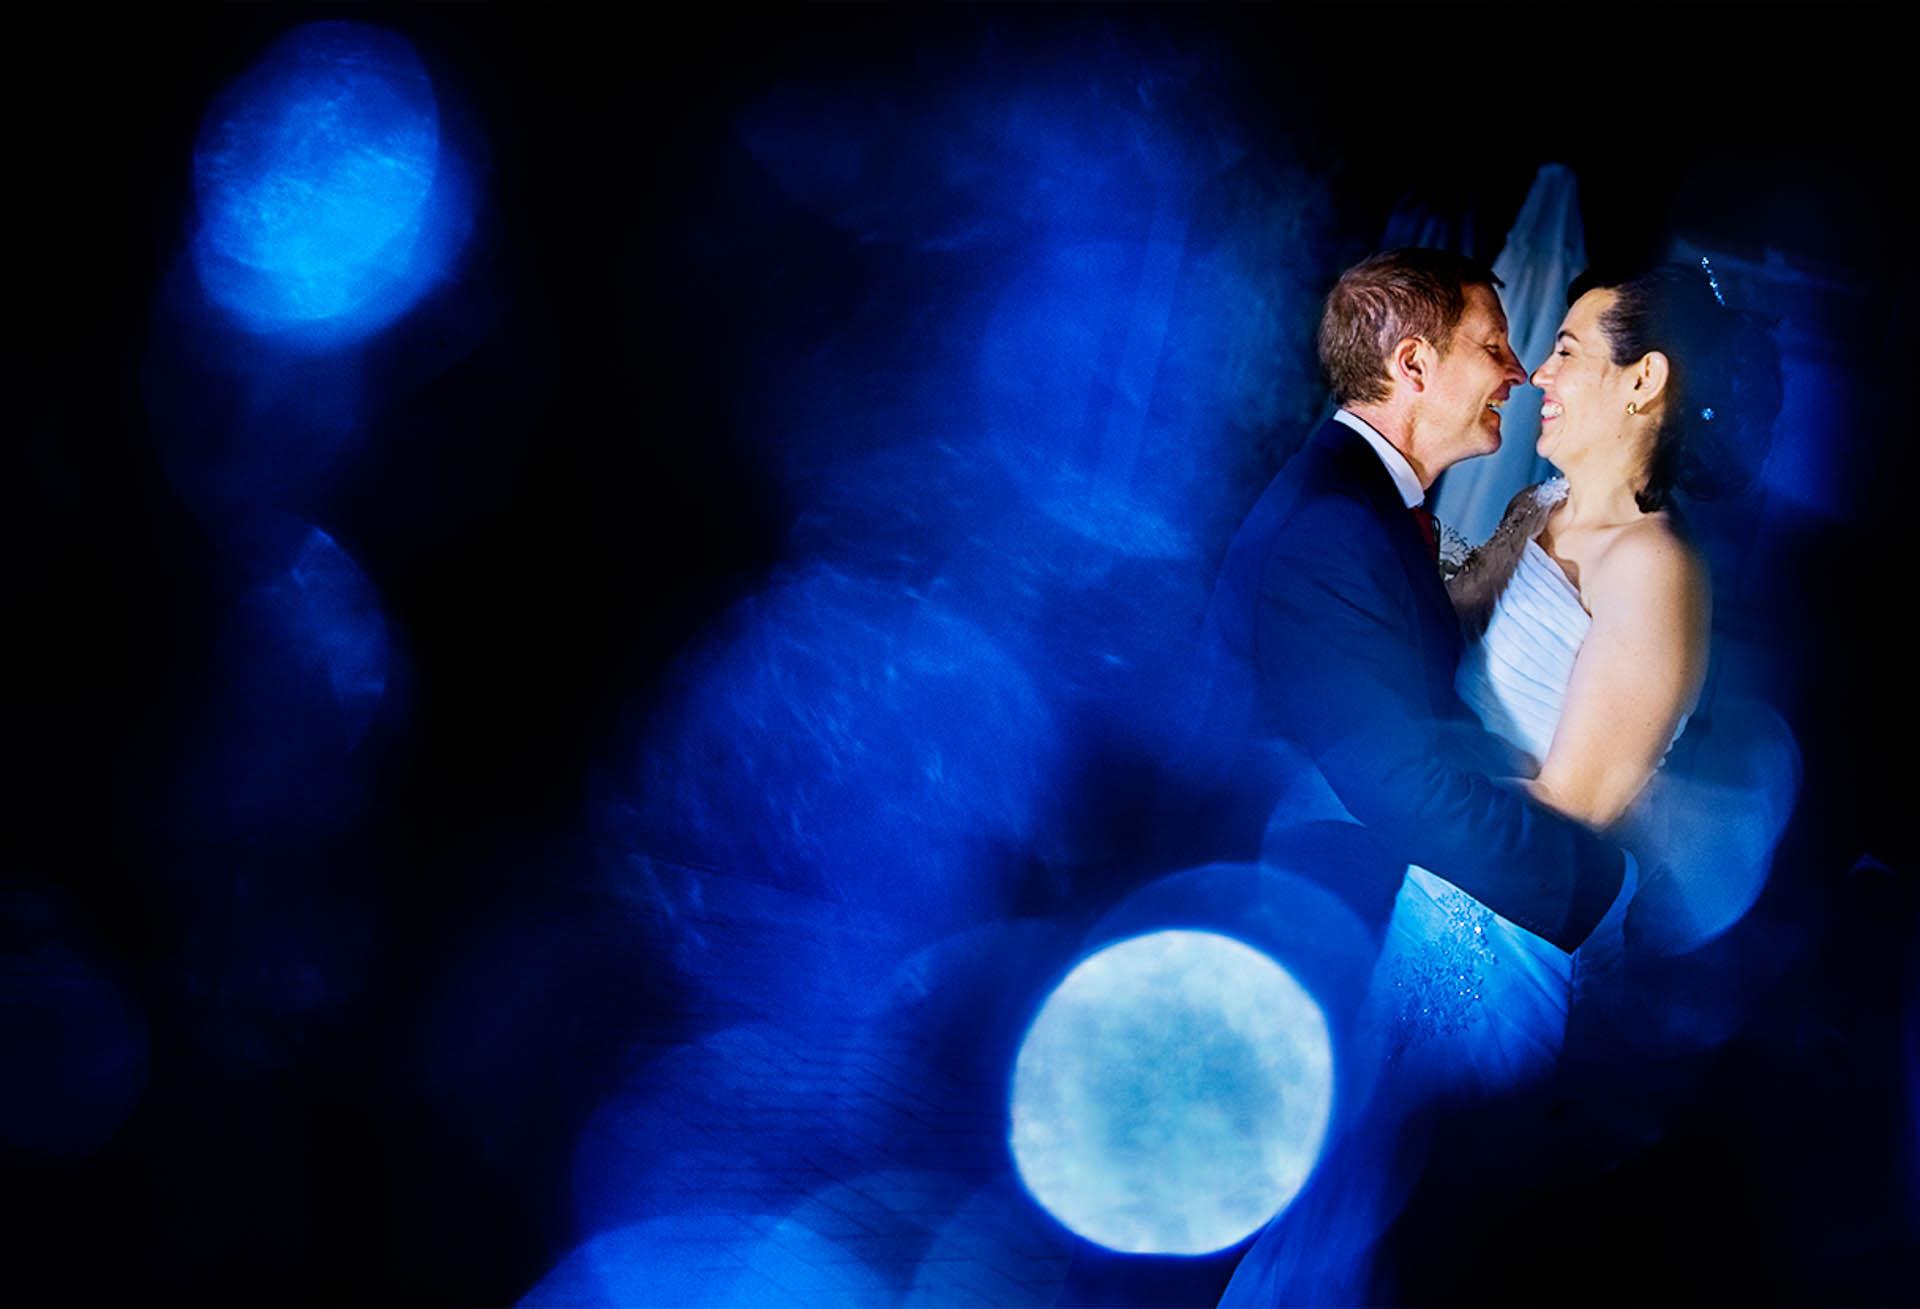 fotografo-de-boda-en-toledo-pilar-garcia